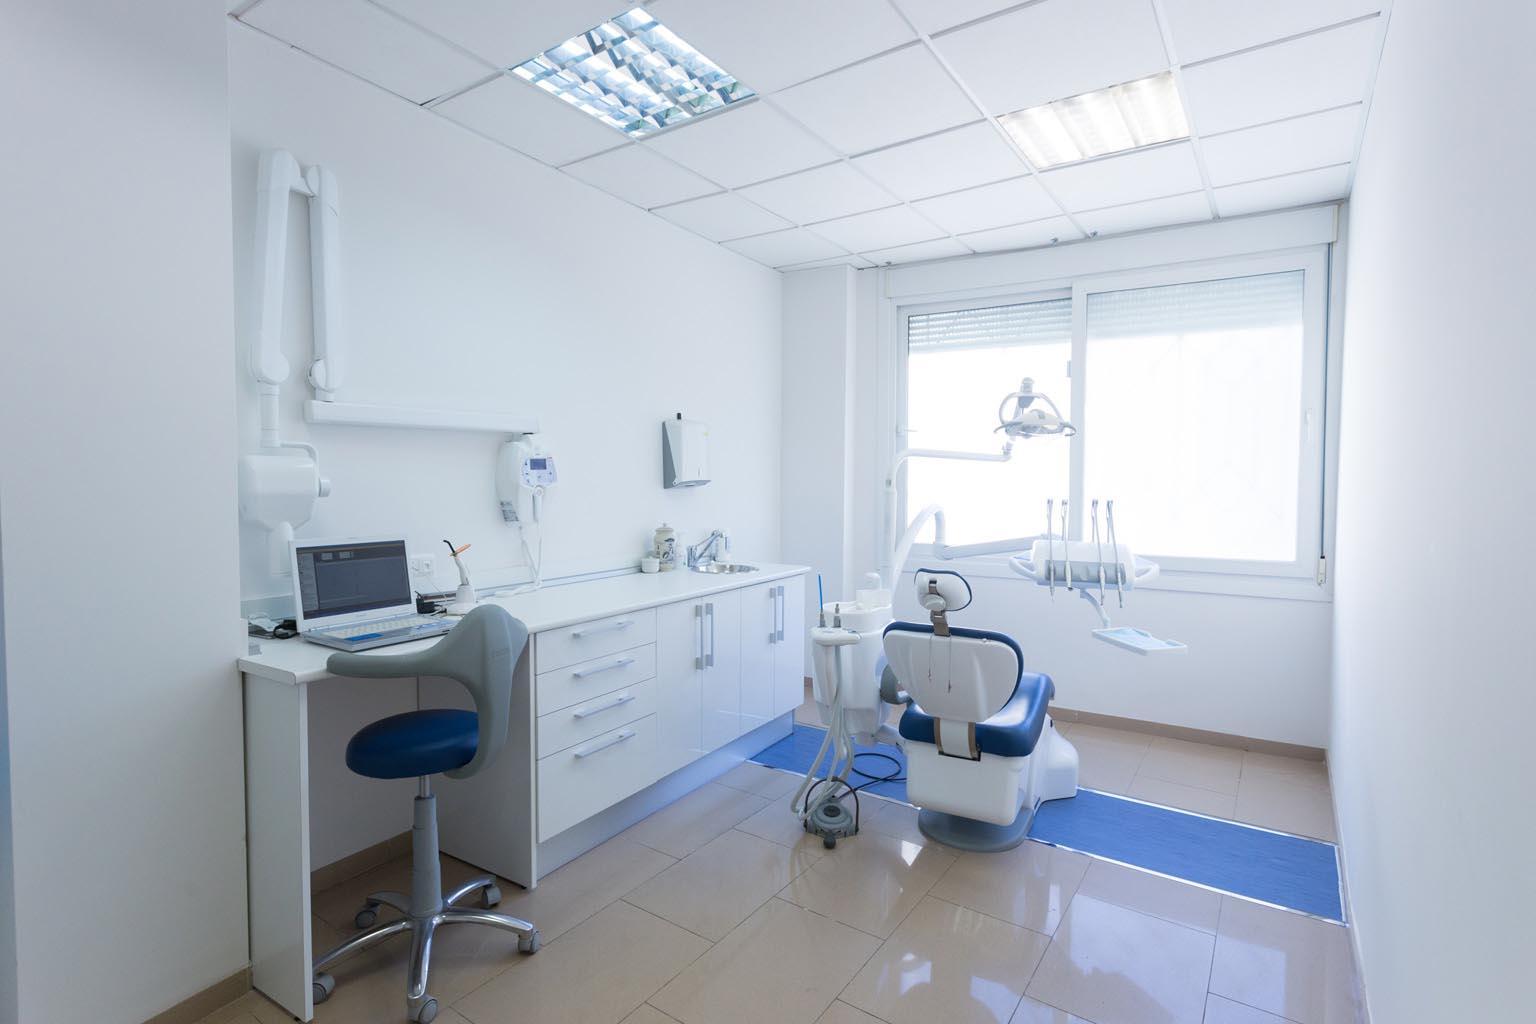 Clínica dental en Almería - Clínica Dental Palmilla